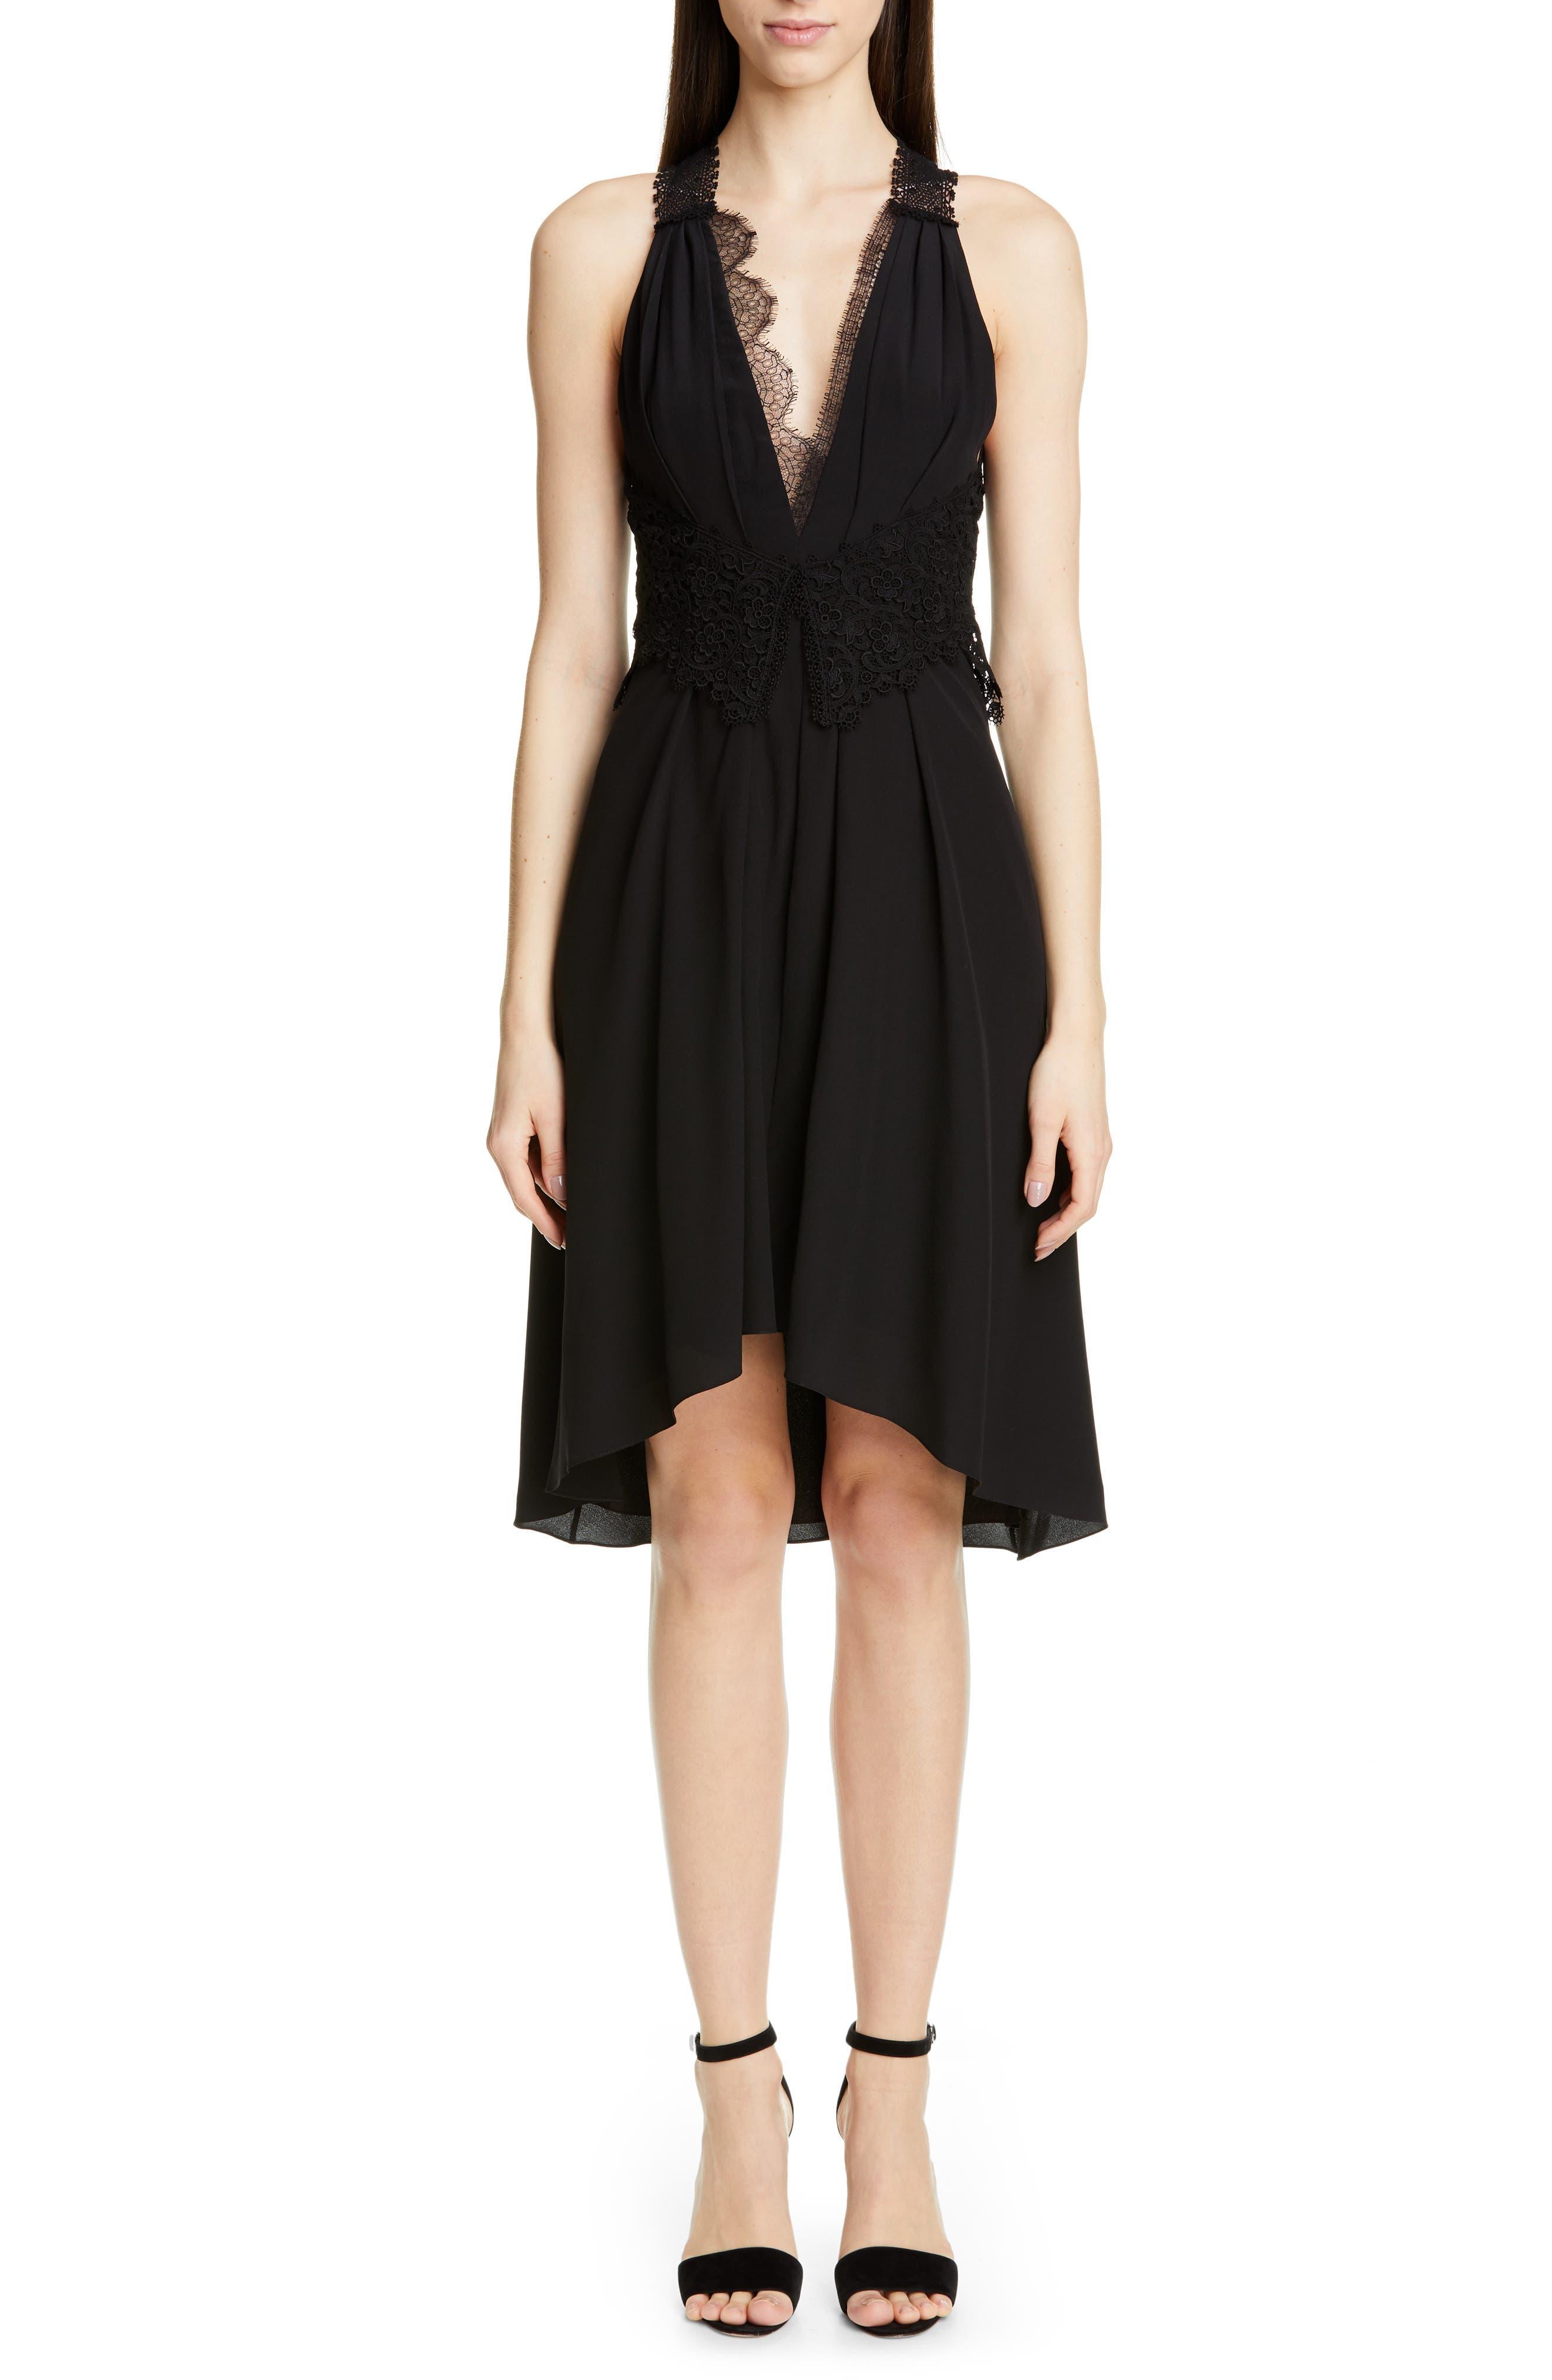 VICTORIA BECKHAM, Mixed Lace Trim High/Low Silk Dress, Main thumbnail 1, color, BLACK